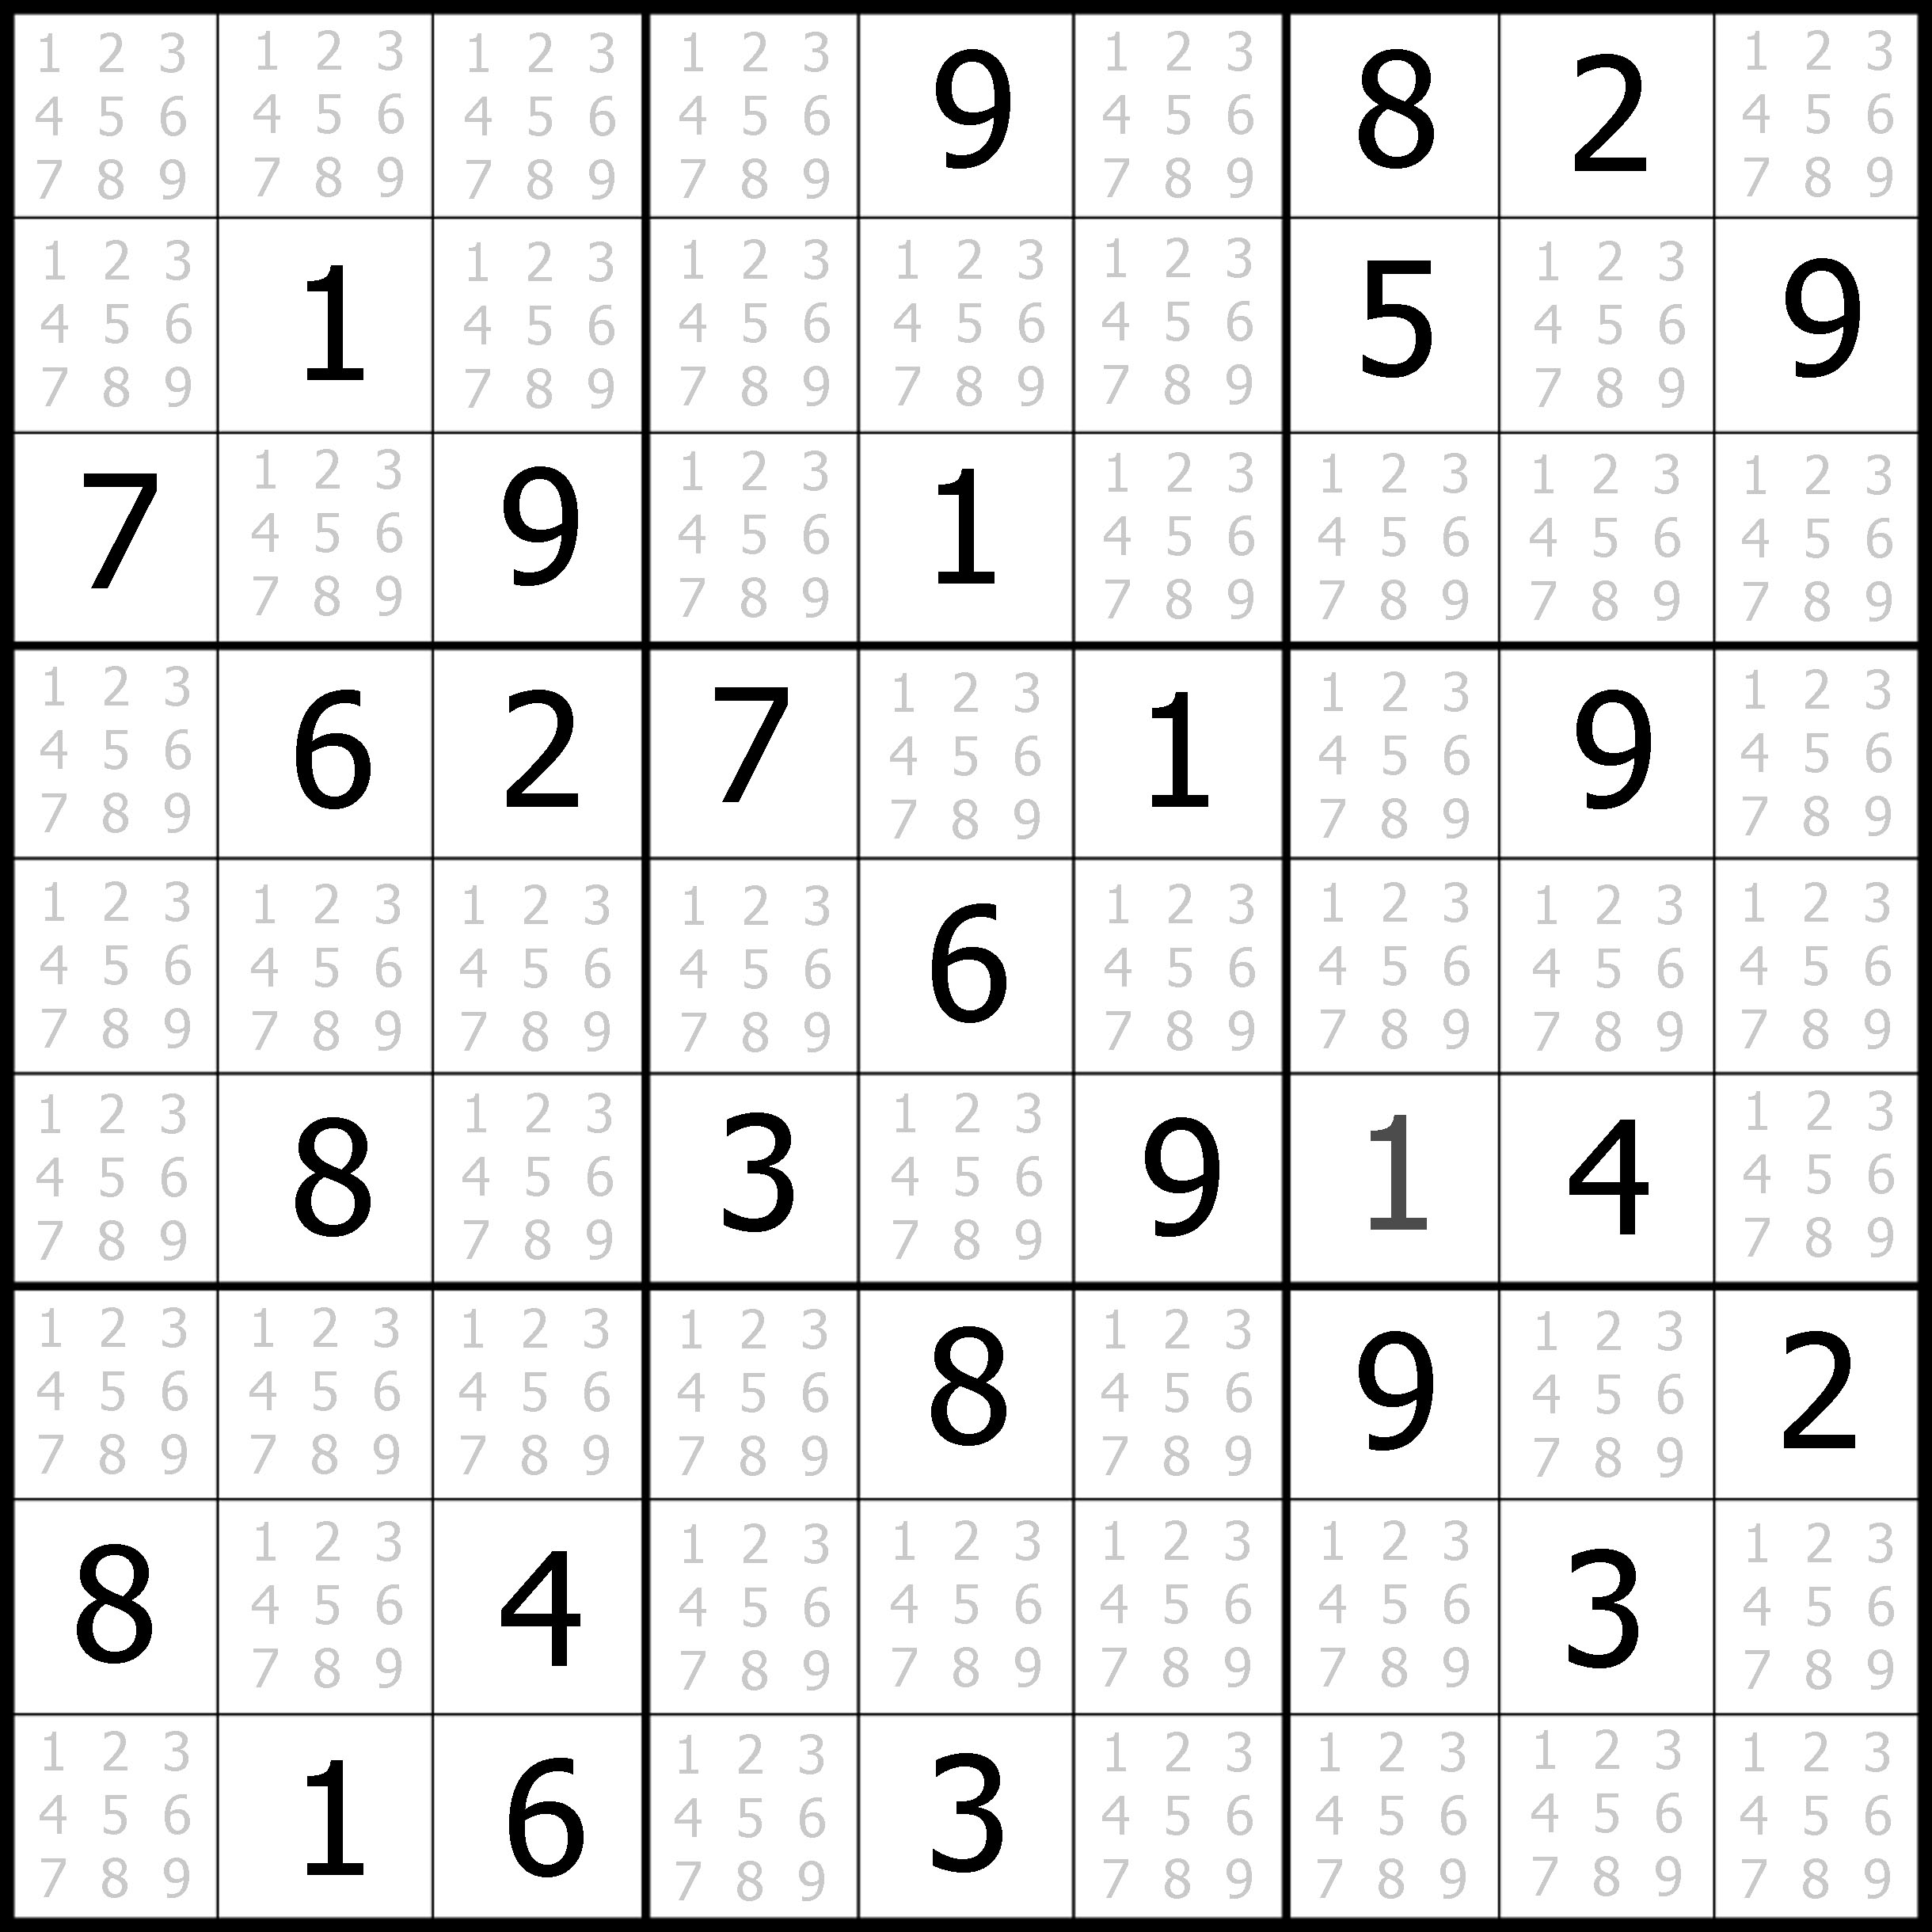 Sudoku Puzzler   Free, Printable, Updated Sudoku Puzzles With A - Printable Sudoku Puzzles Easy